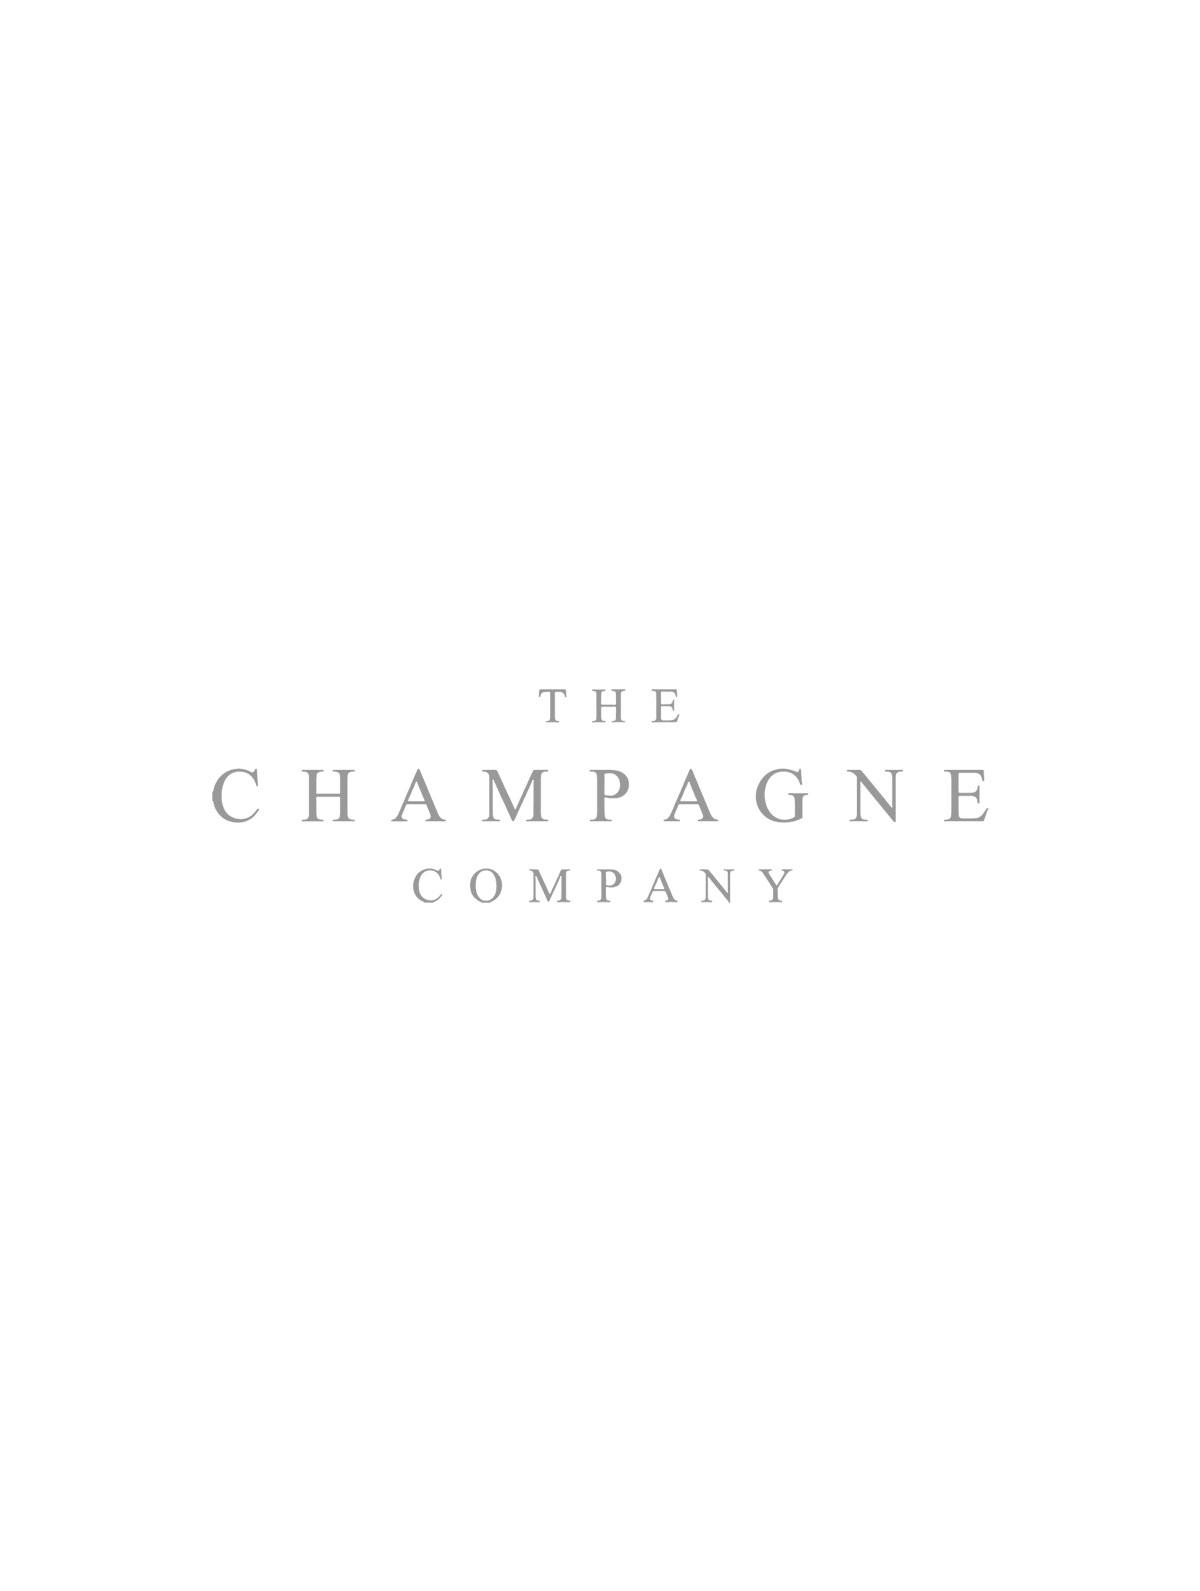 Nikka Whisky Co - Nikka White Label 50cl Gift Boxed